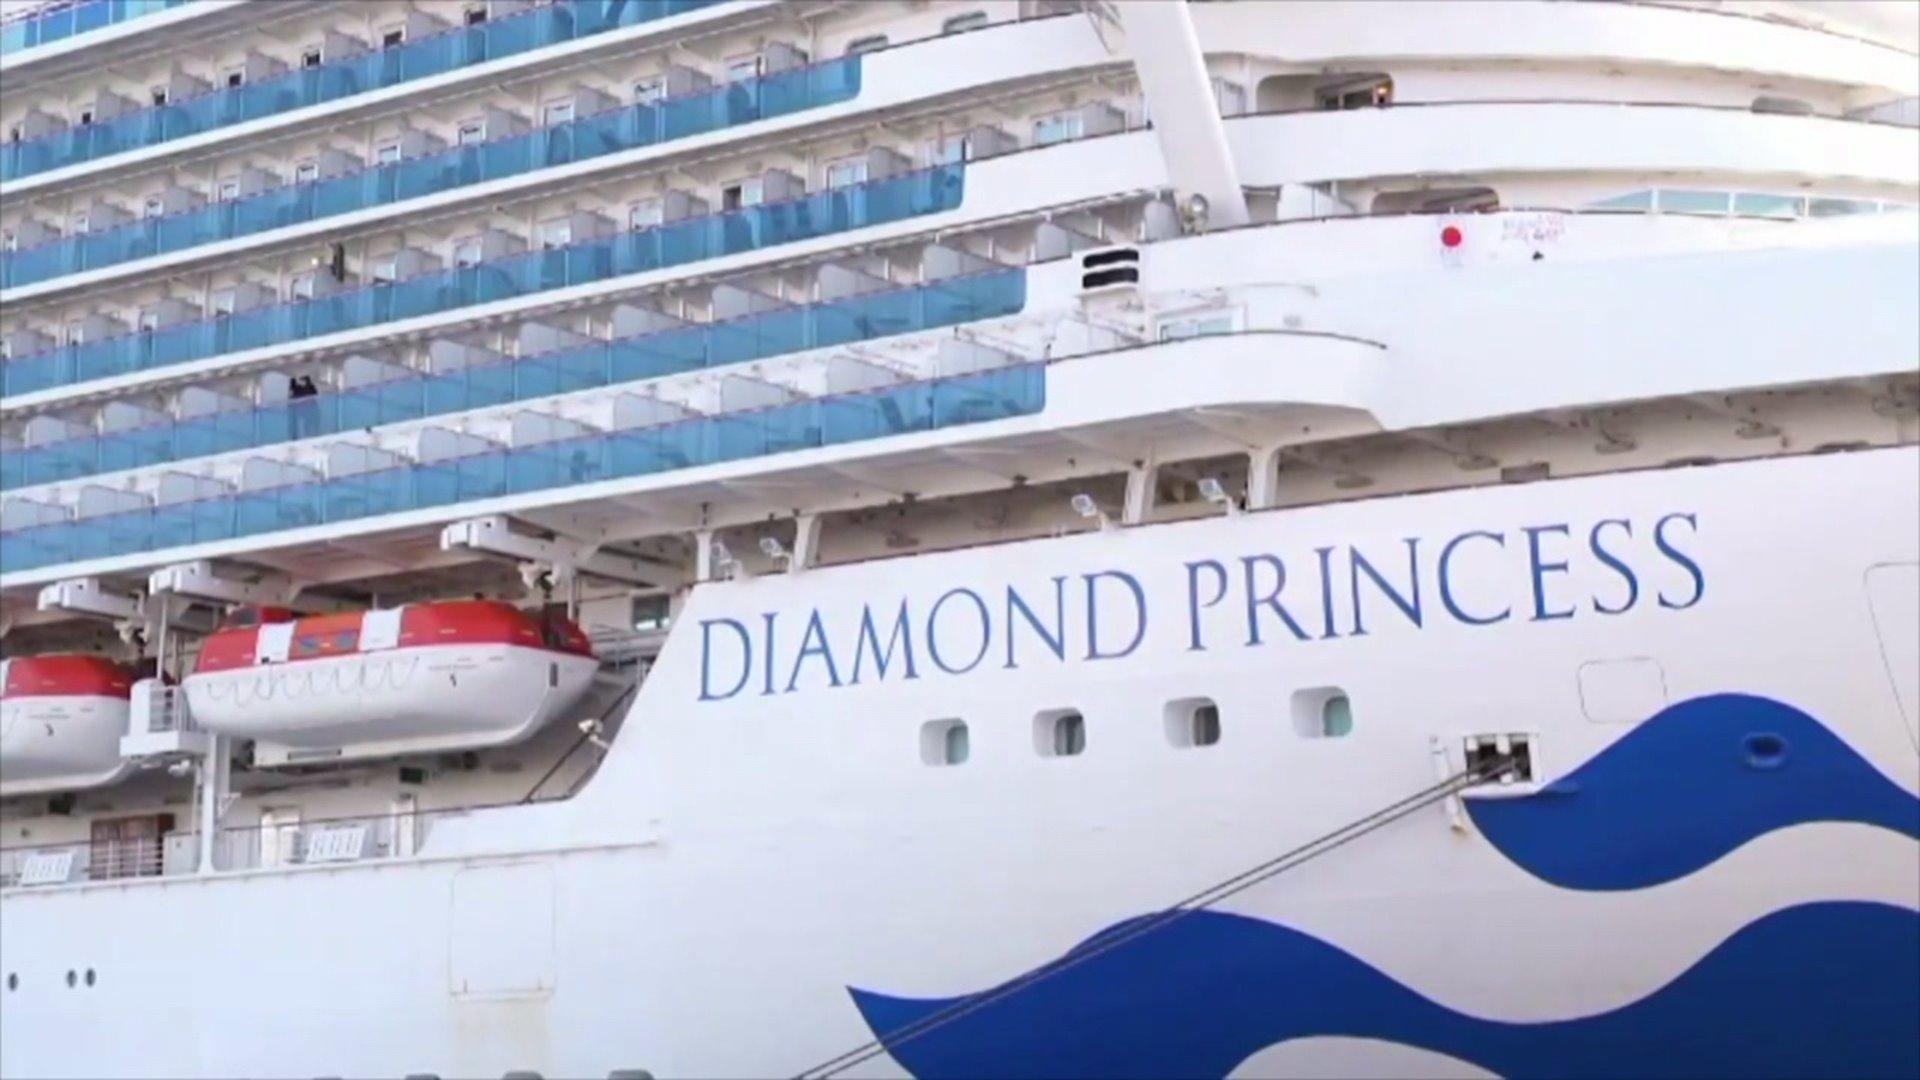 Winston-Salem woman stuck on quarantined cruise ship